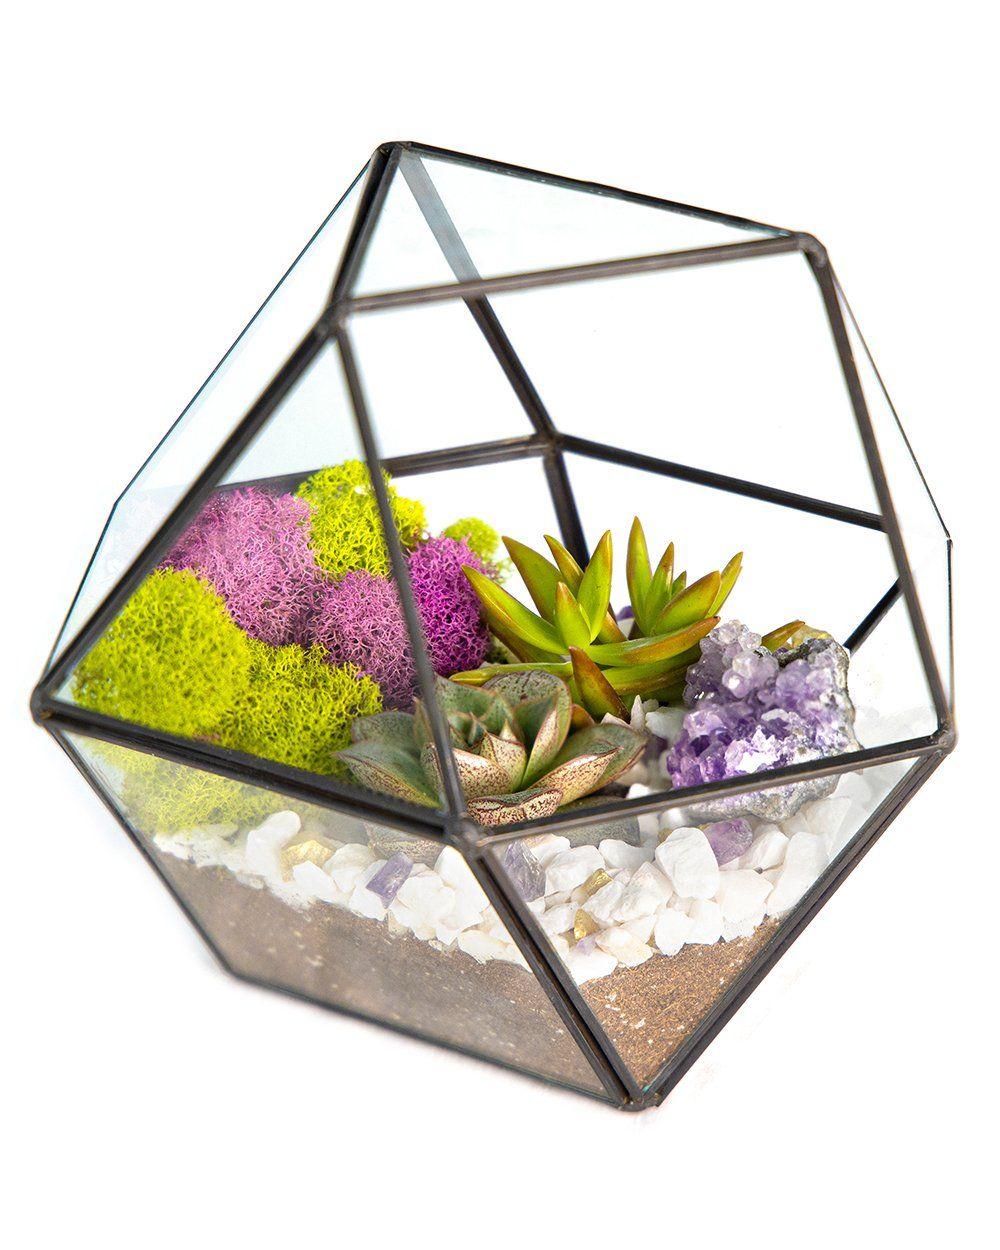 "Photo of 7""x6"" Geo Glass Succulent Terrarium with Metal Stand, Moss, Rocks, Amethyst *DIY Live Plant Terrarium Kit* – Green/Gold / Amethyst Geode"